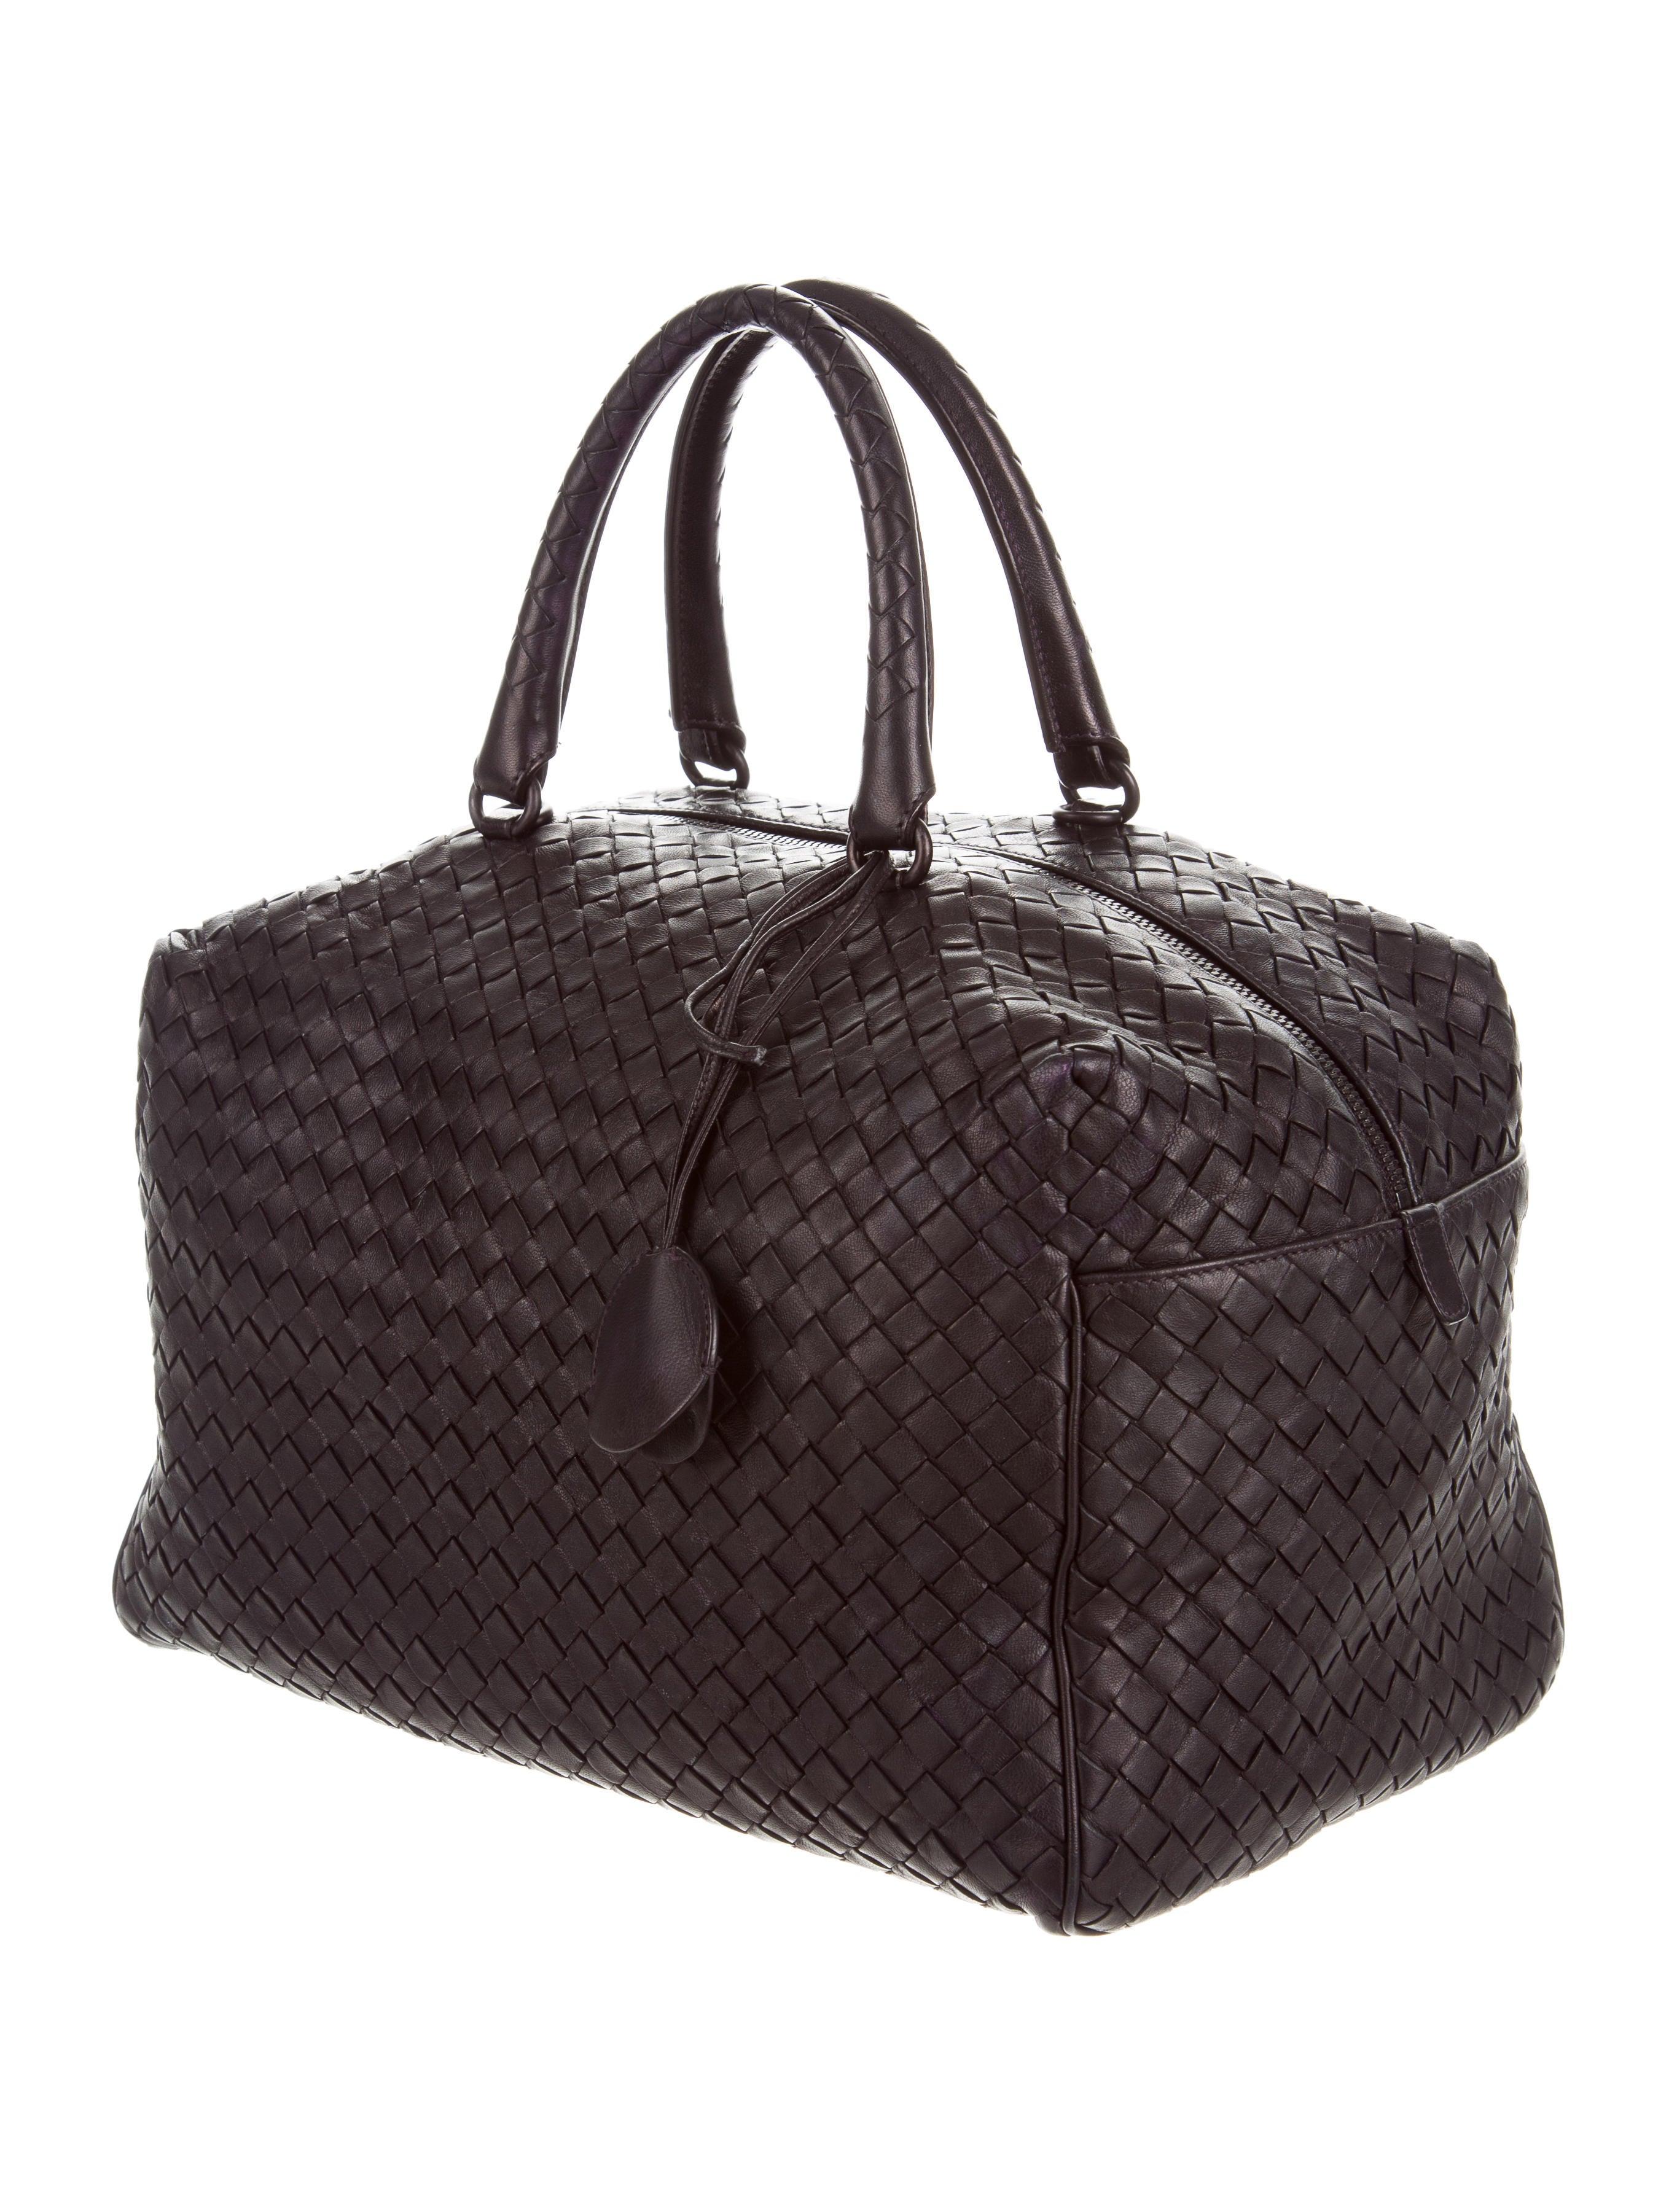 Boston Bag Patchwork Tutorial: Bottega Veneta Intrecciato Mini Boston Bag